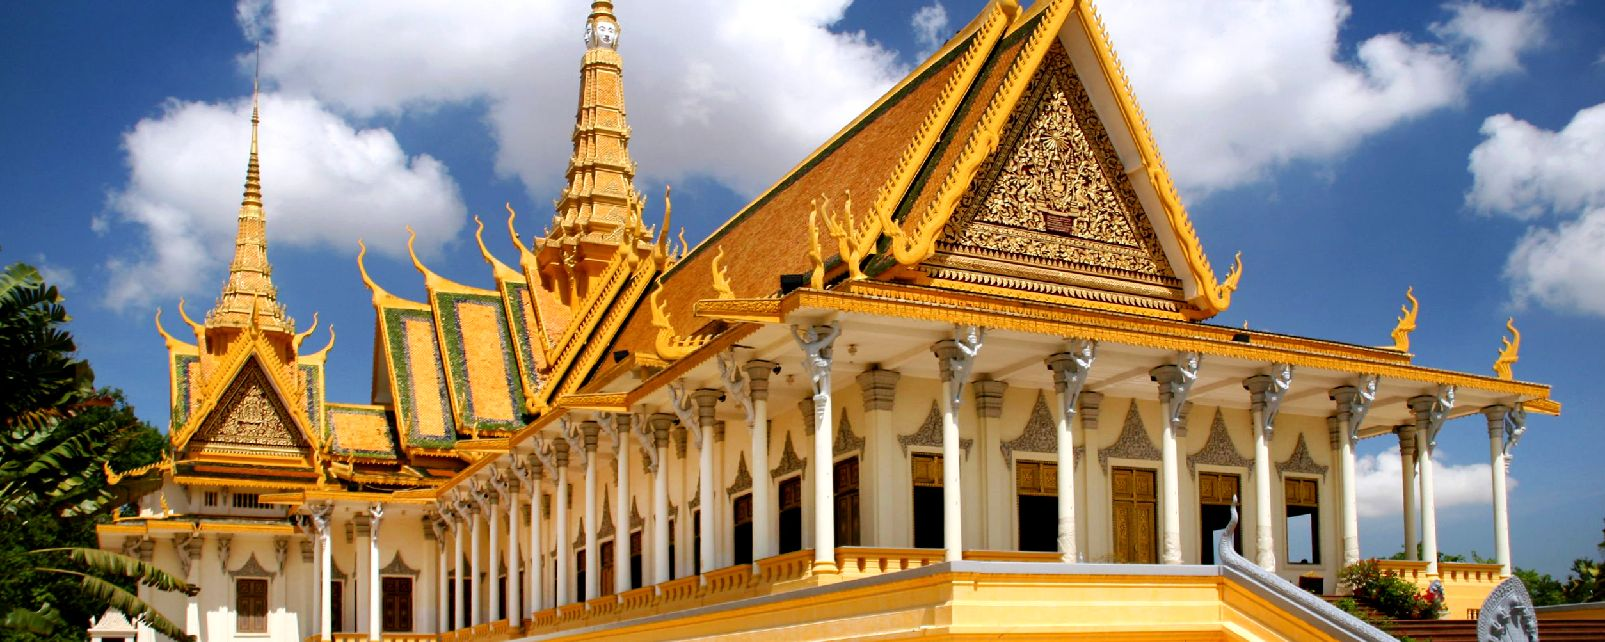 Fabuleux Le palais royal de Phnom Penh - Cambodge QO94